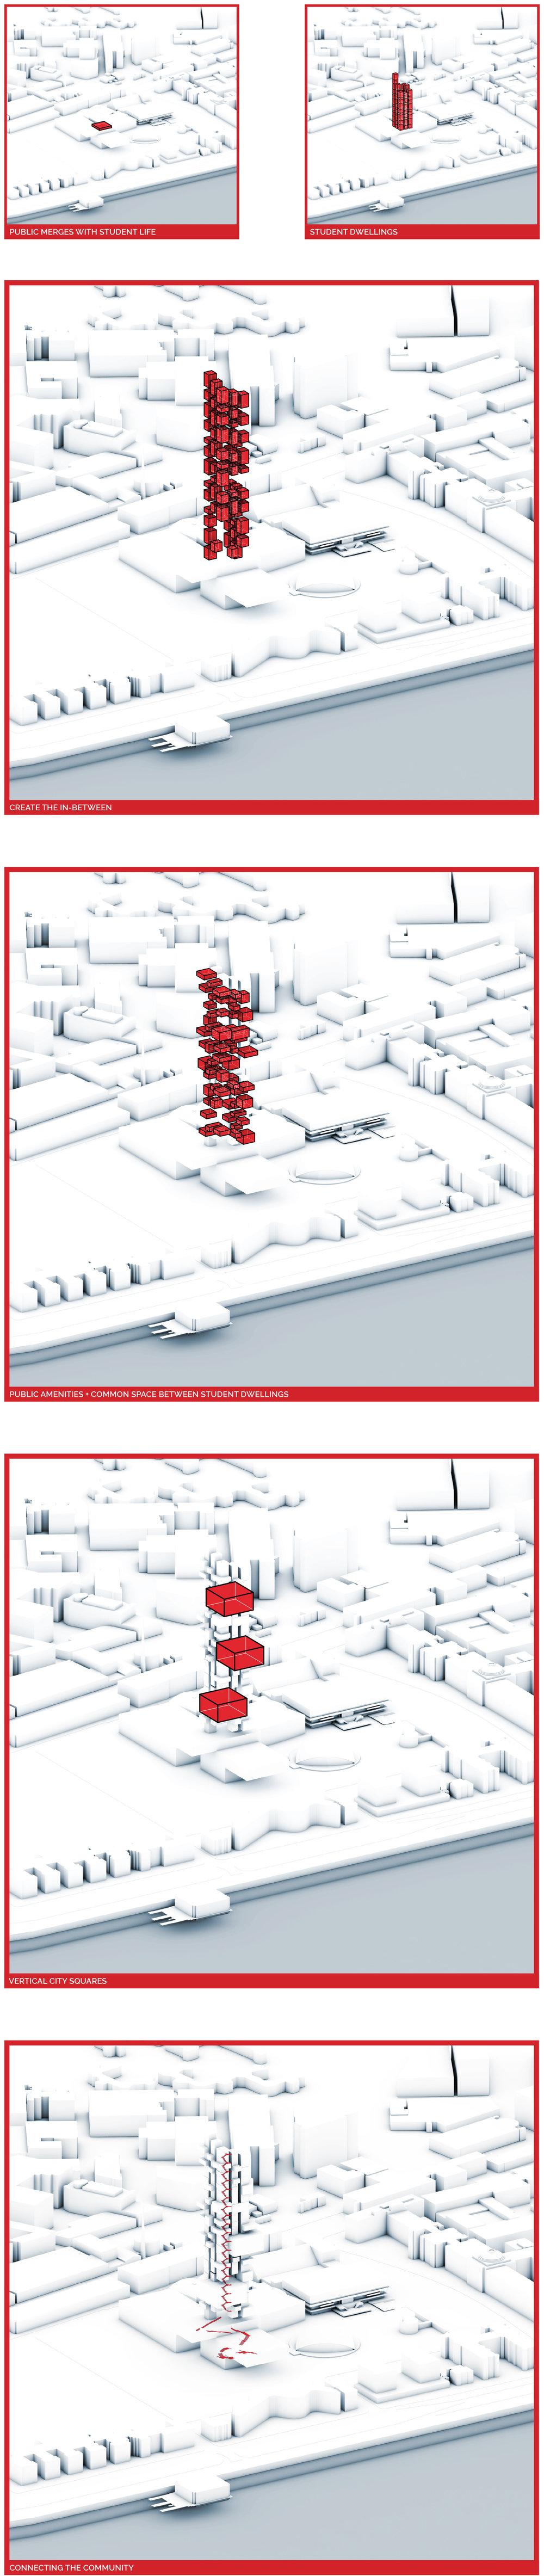 Final_18x72_05 Building Dgram.jpg